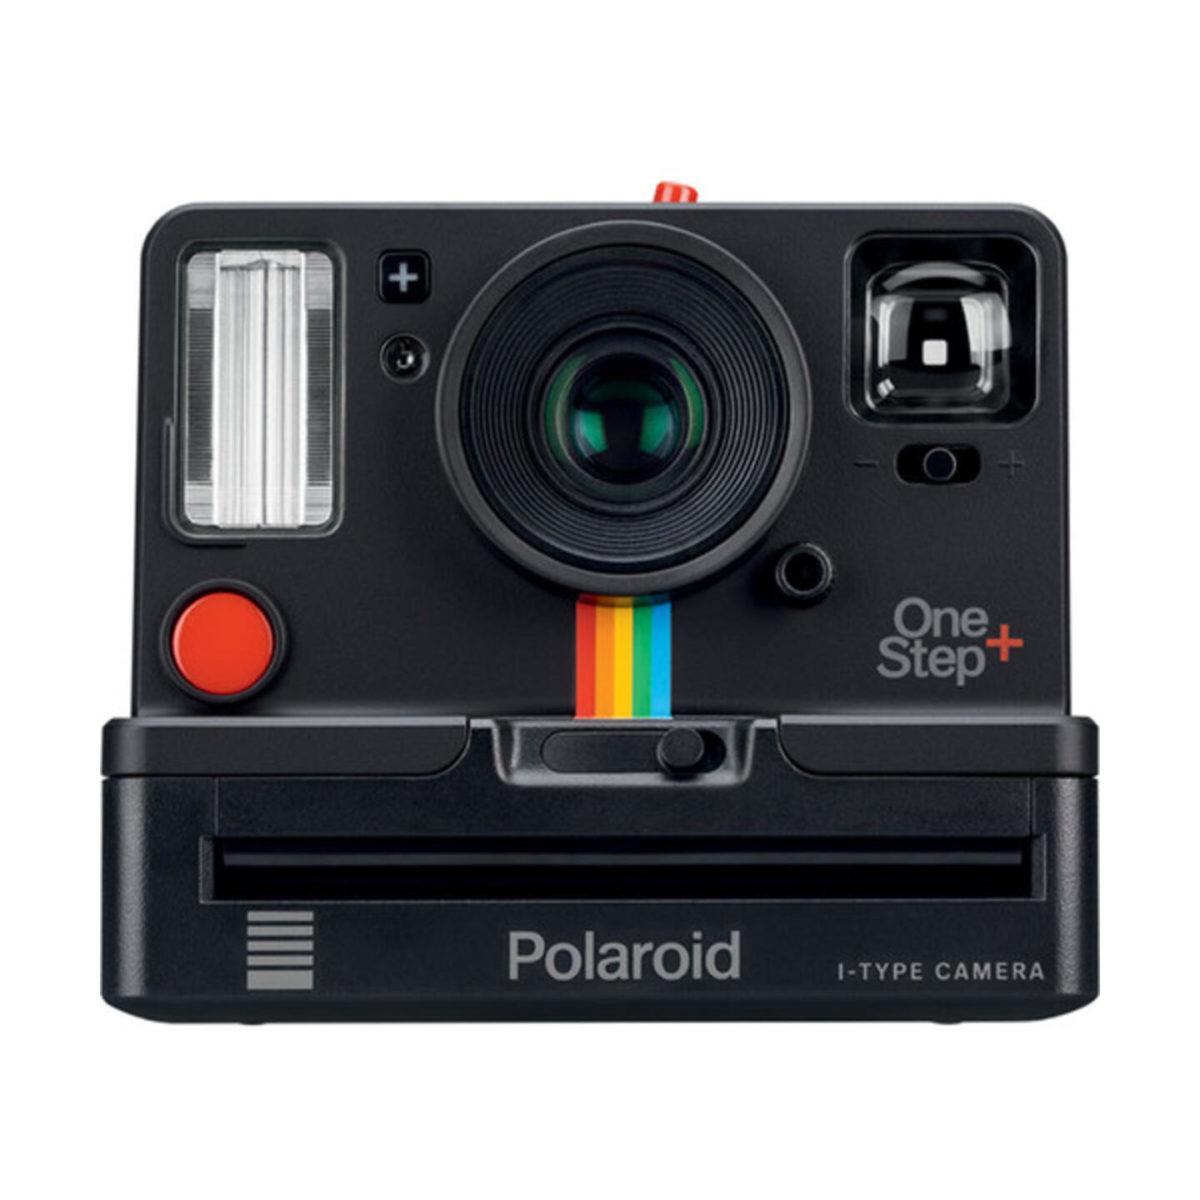 polaroid_onestep_sofortbildkamera_schwarz_01